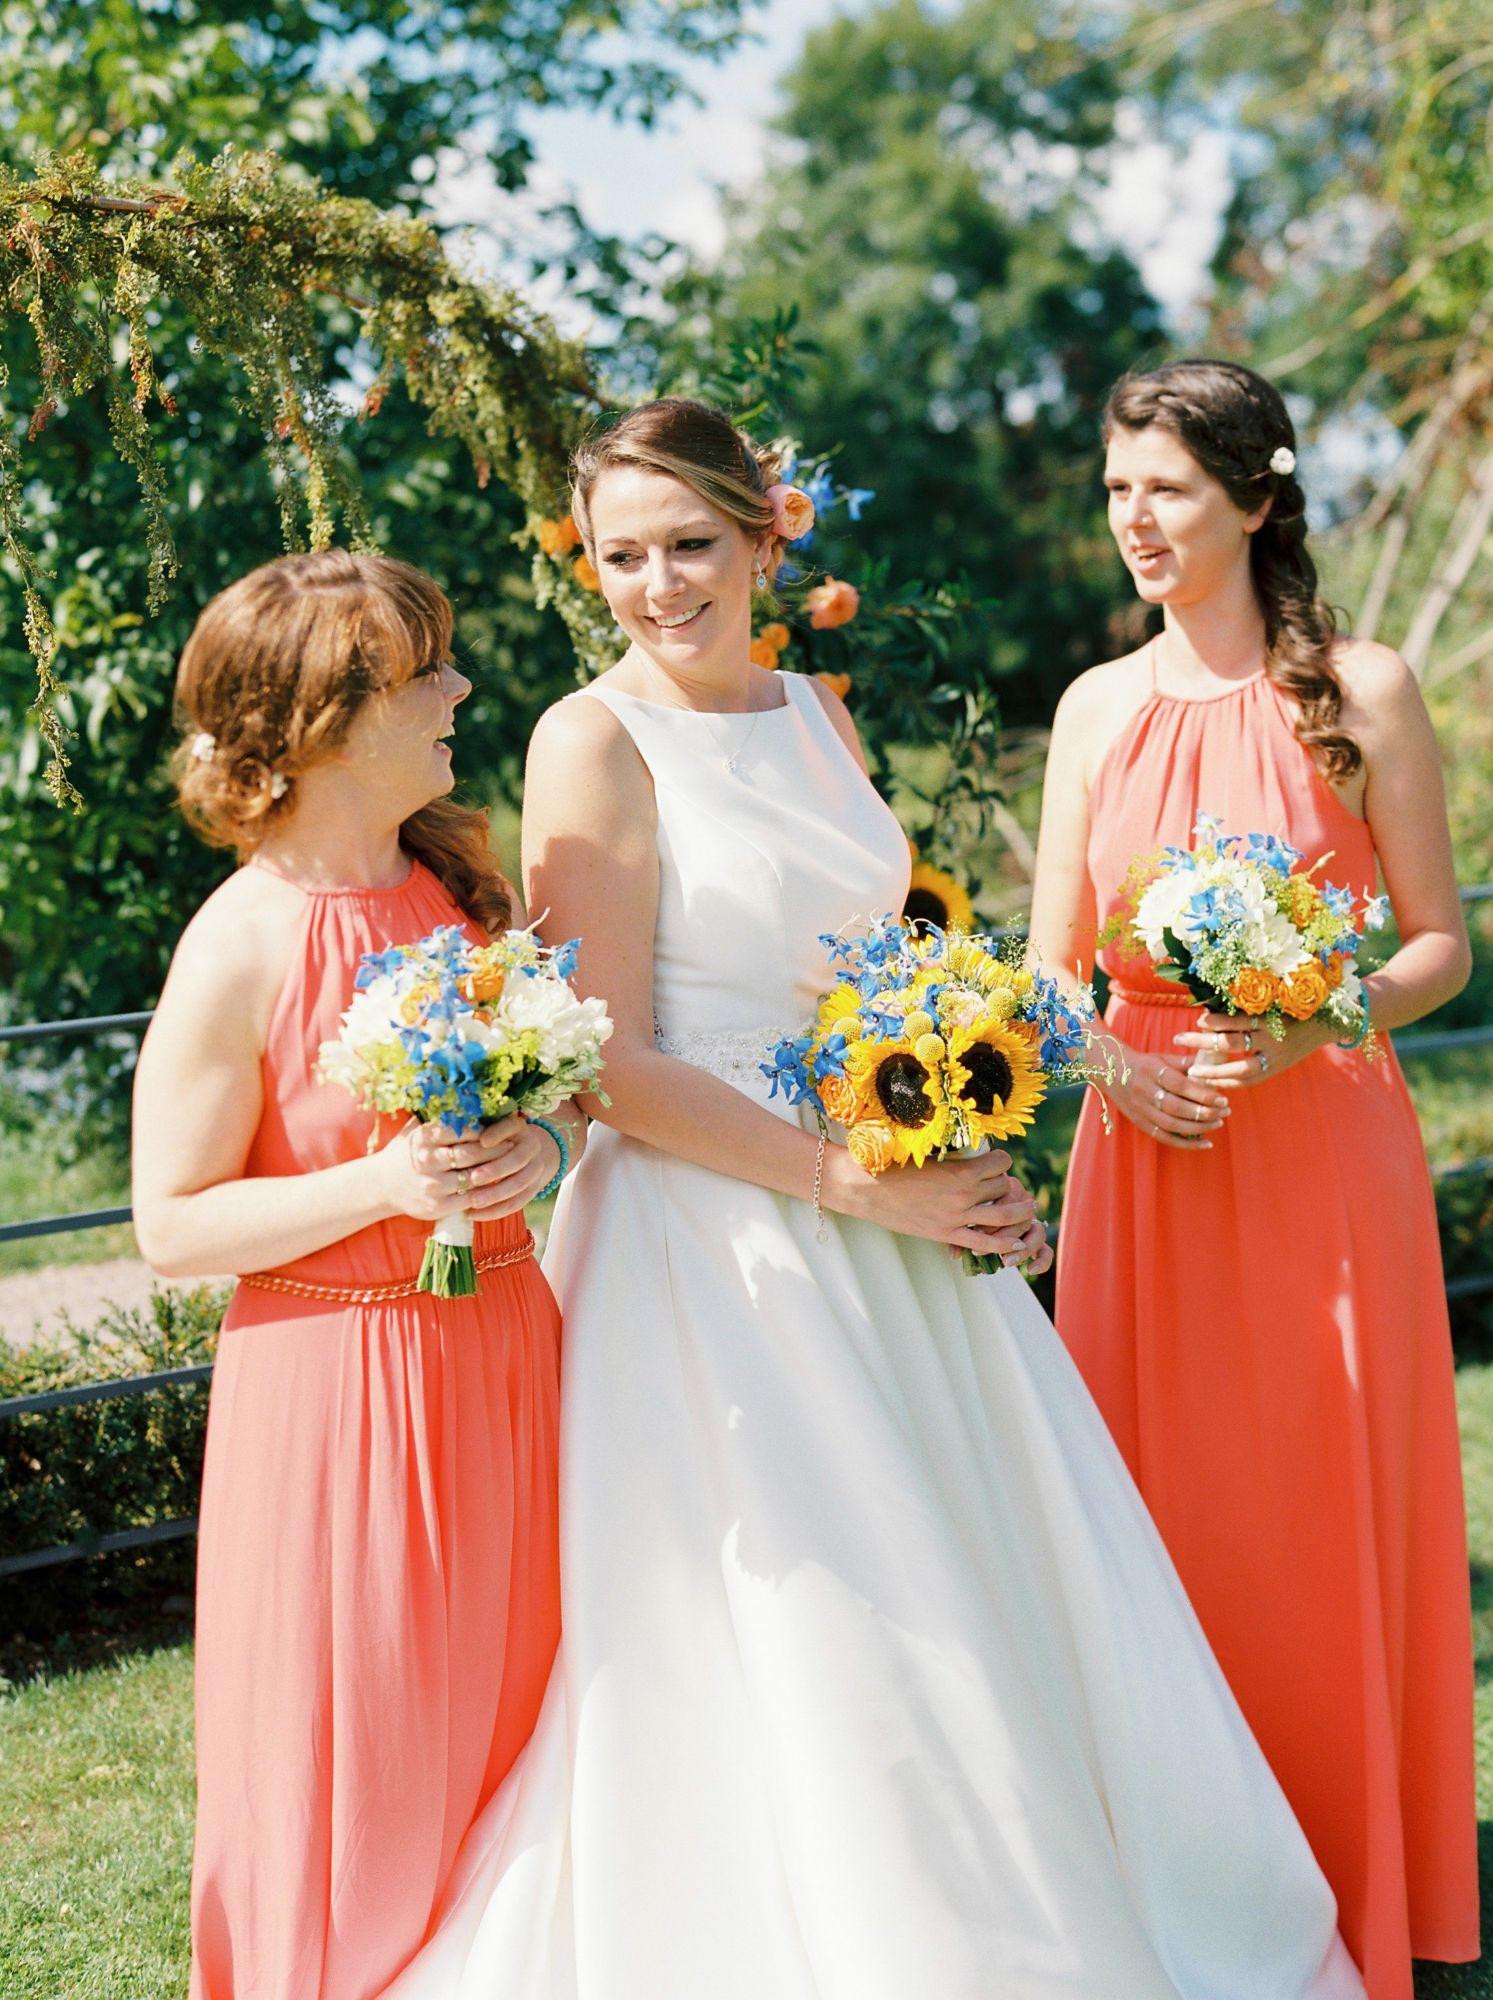 Terry-Li-Photography-David-Jennifer-Wedding-Day-film-photos-39.jpg